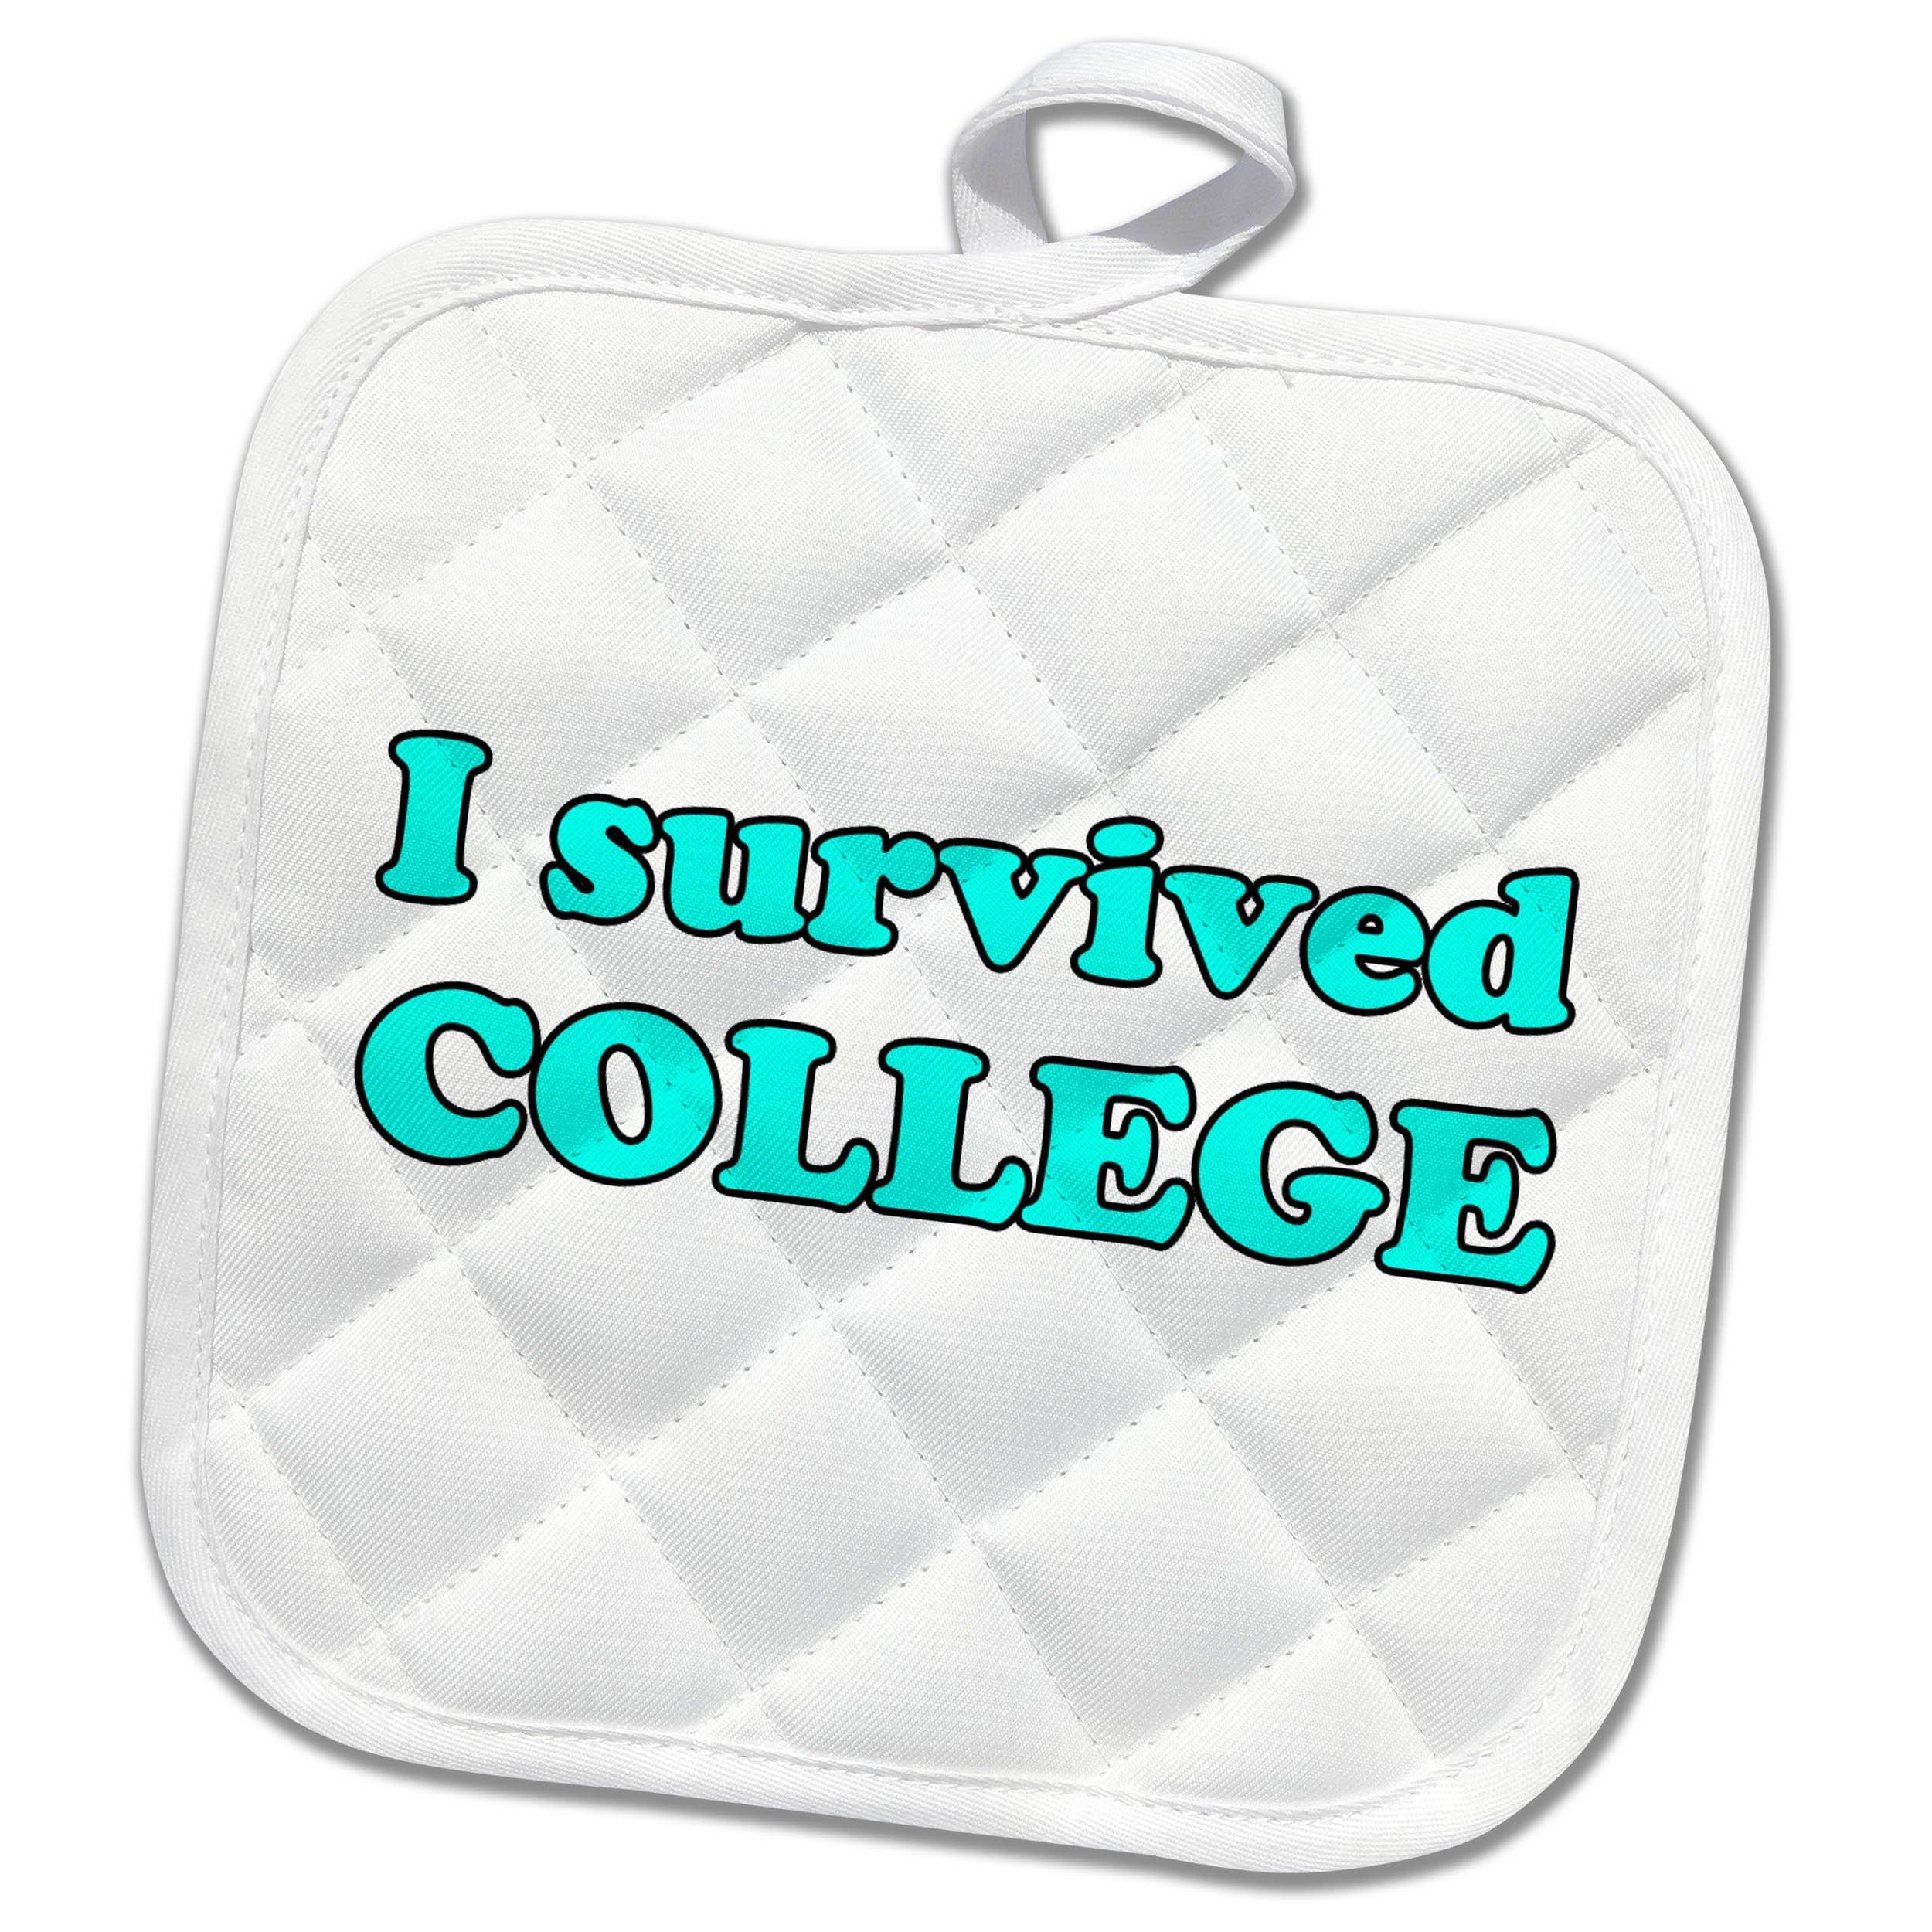 3dRose Student Humor - I Survived College Turquoise - 8x8 Potholder (phl_274508_1)